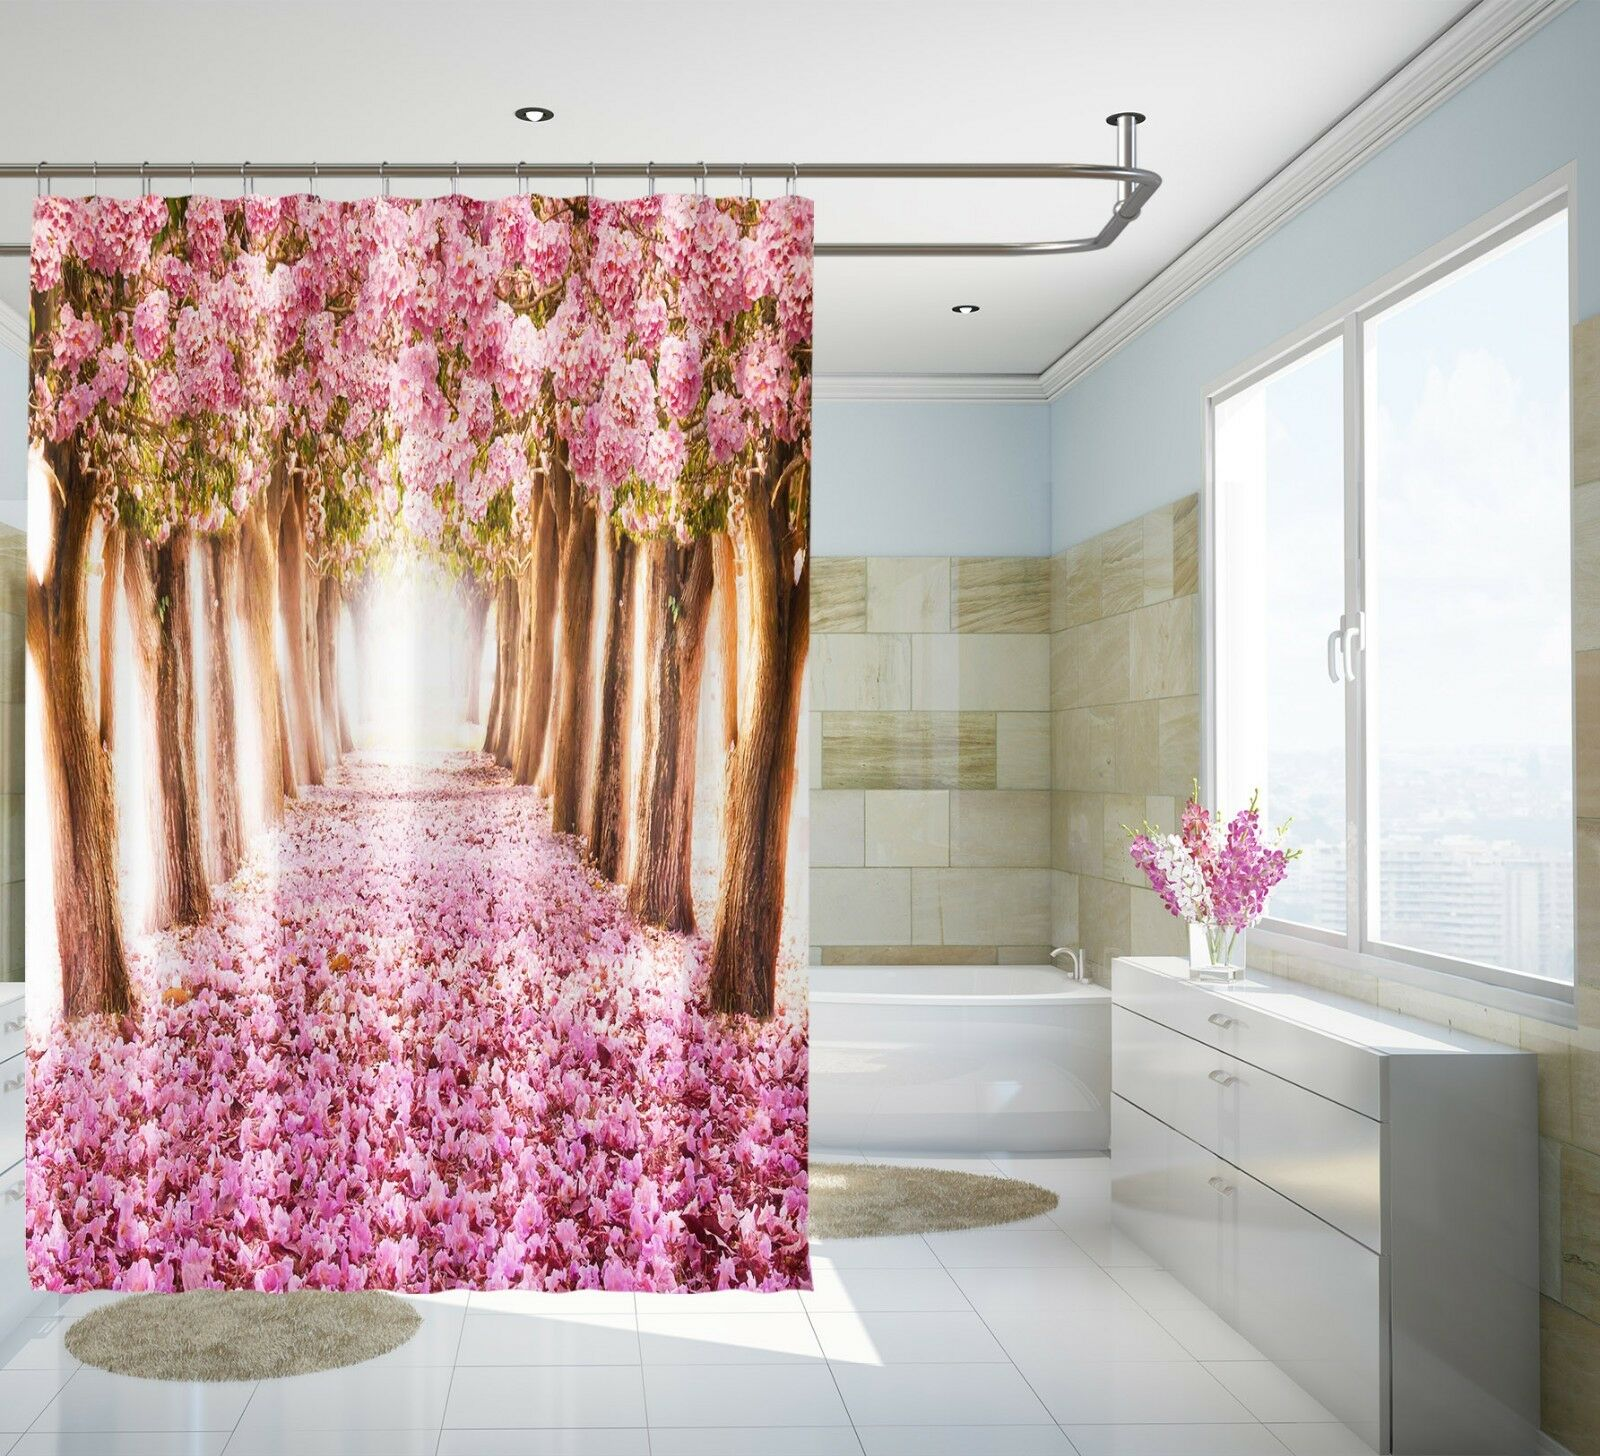 3D Kirschblüte Pfad 7 Duschvorhang Wasserdicht Wasserdicht Wasserdicht Faser Bad Daheim Window Toilette | Großhandel  | Deutschland Shops  96f619